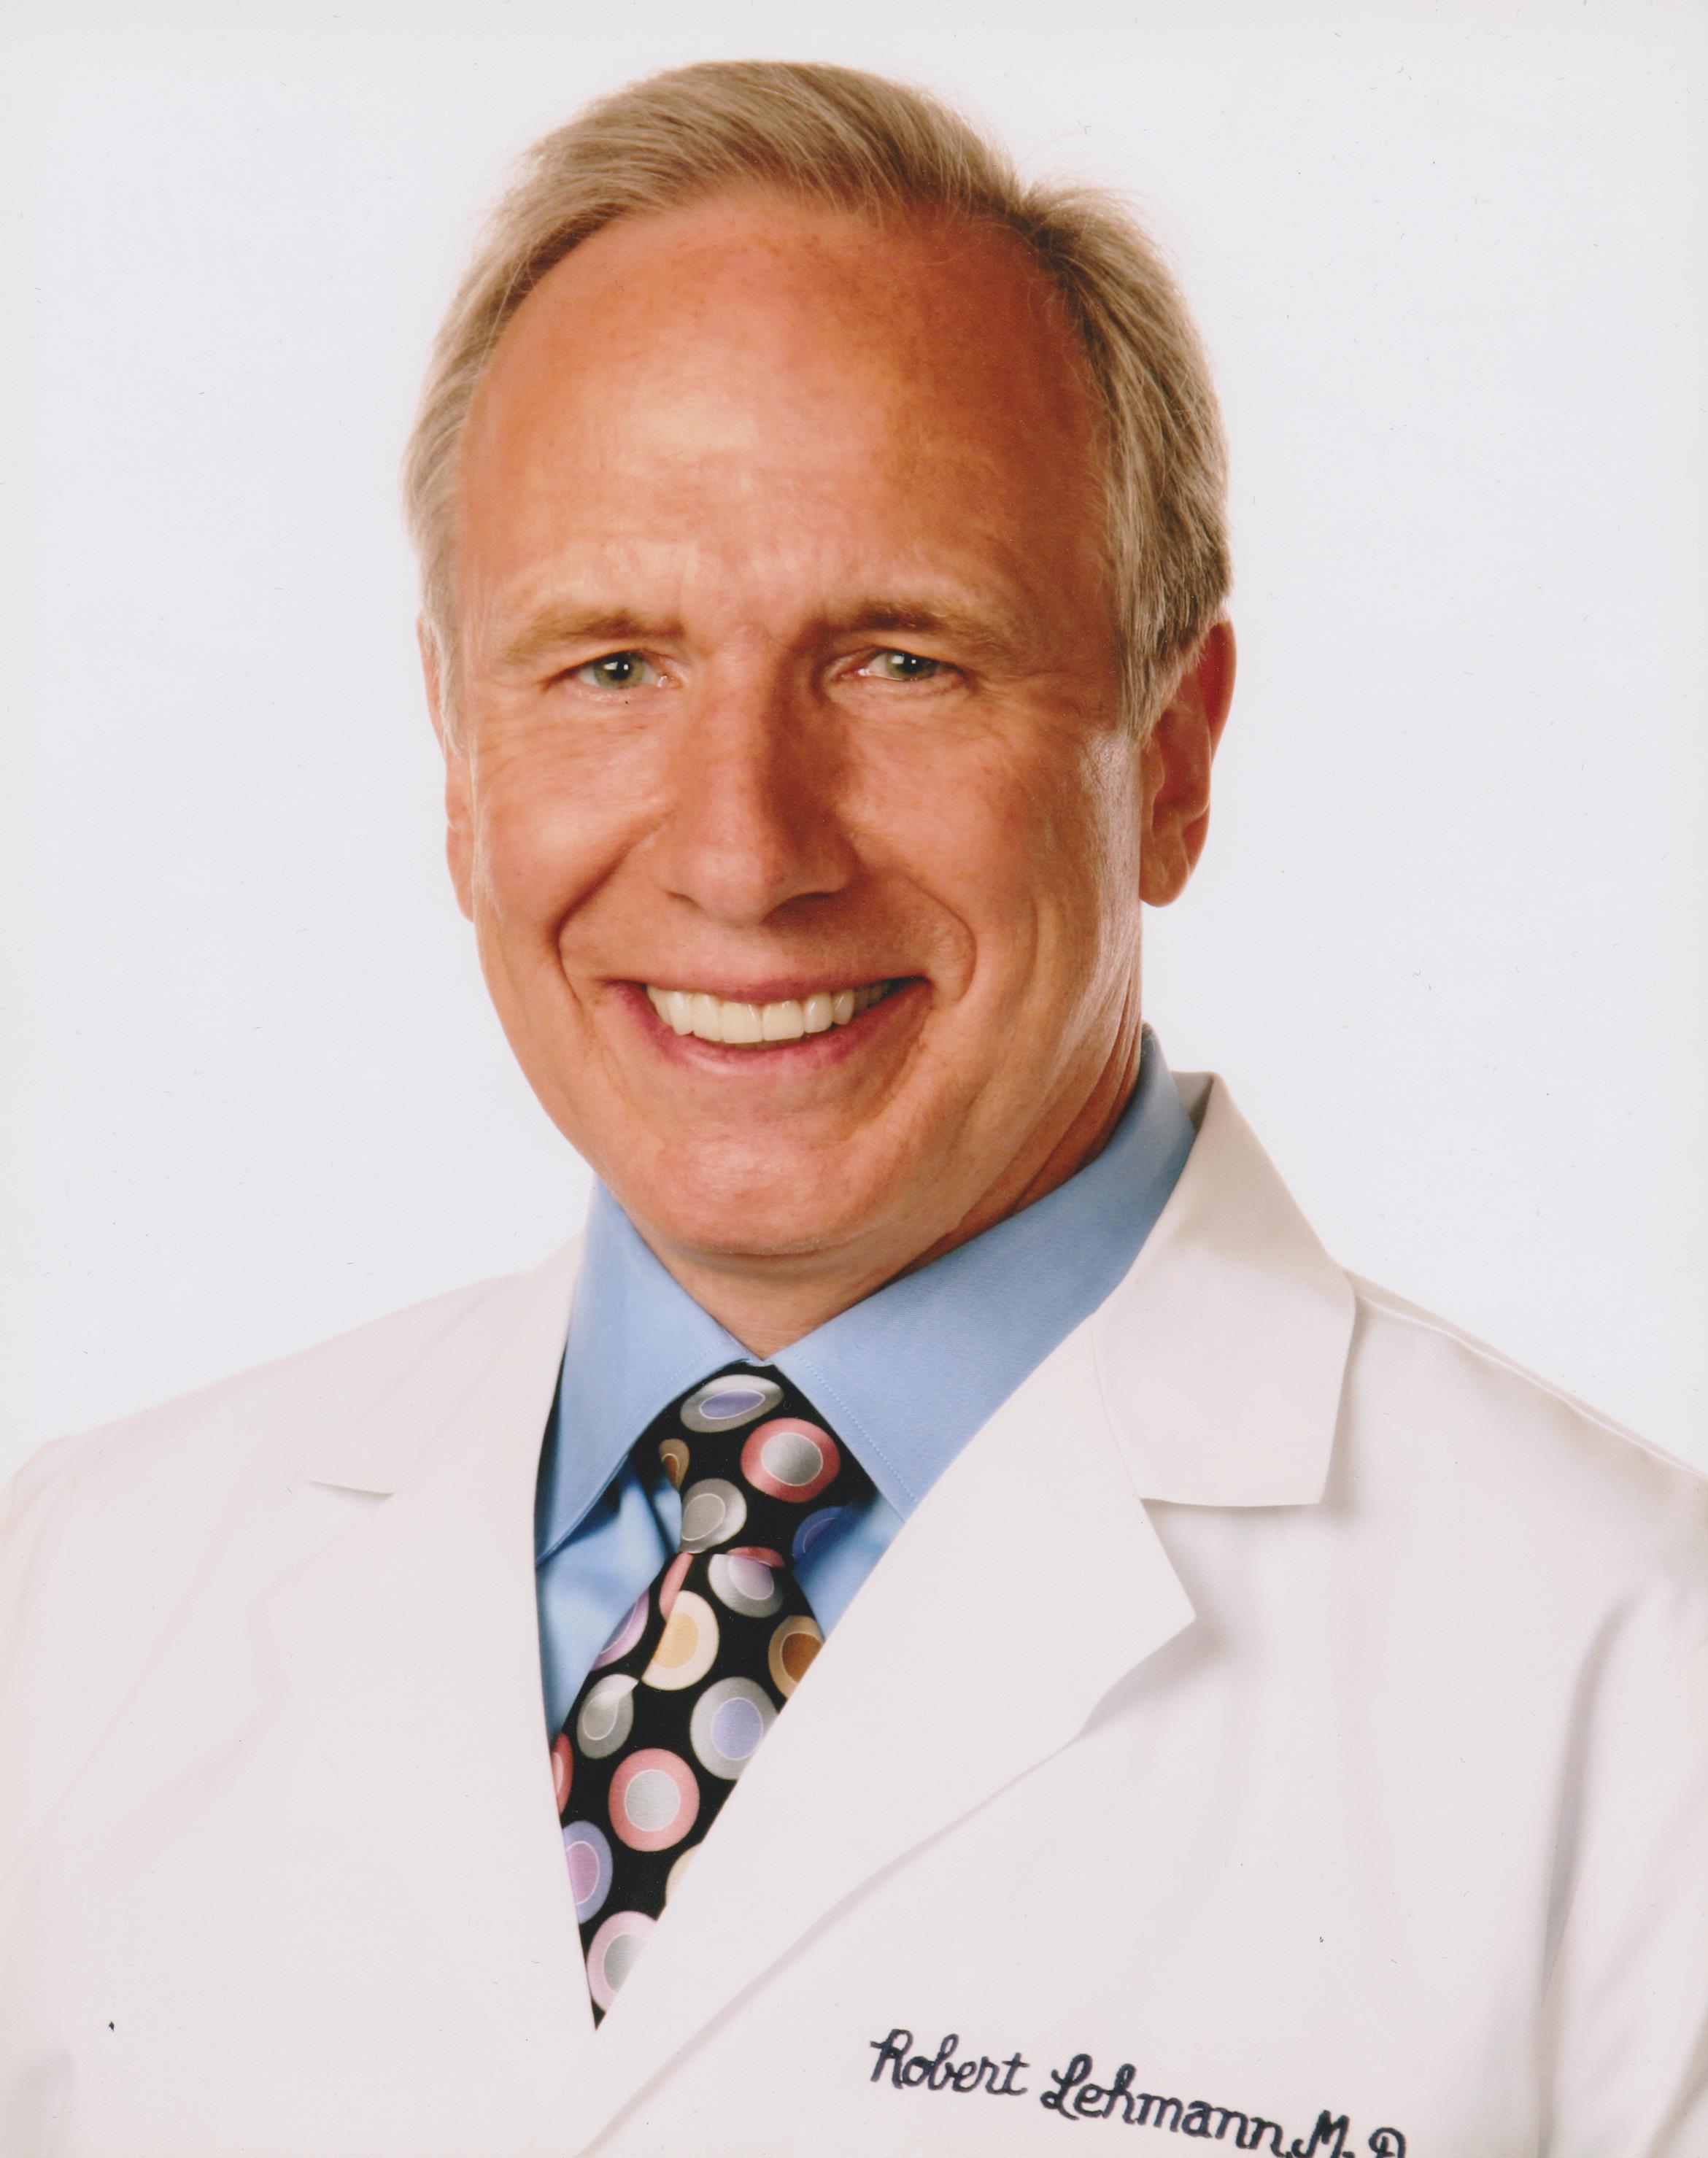 Dr. Robert Lehmann, Lehmann Eye Center